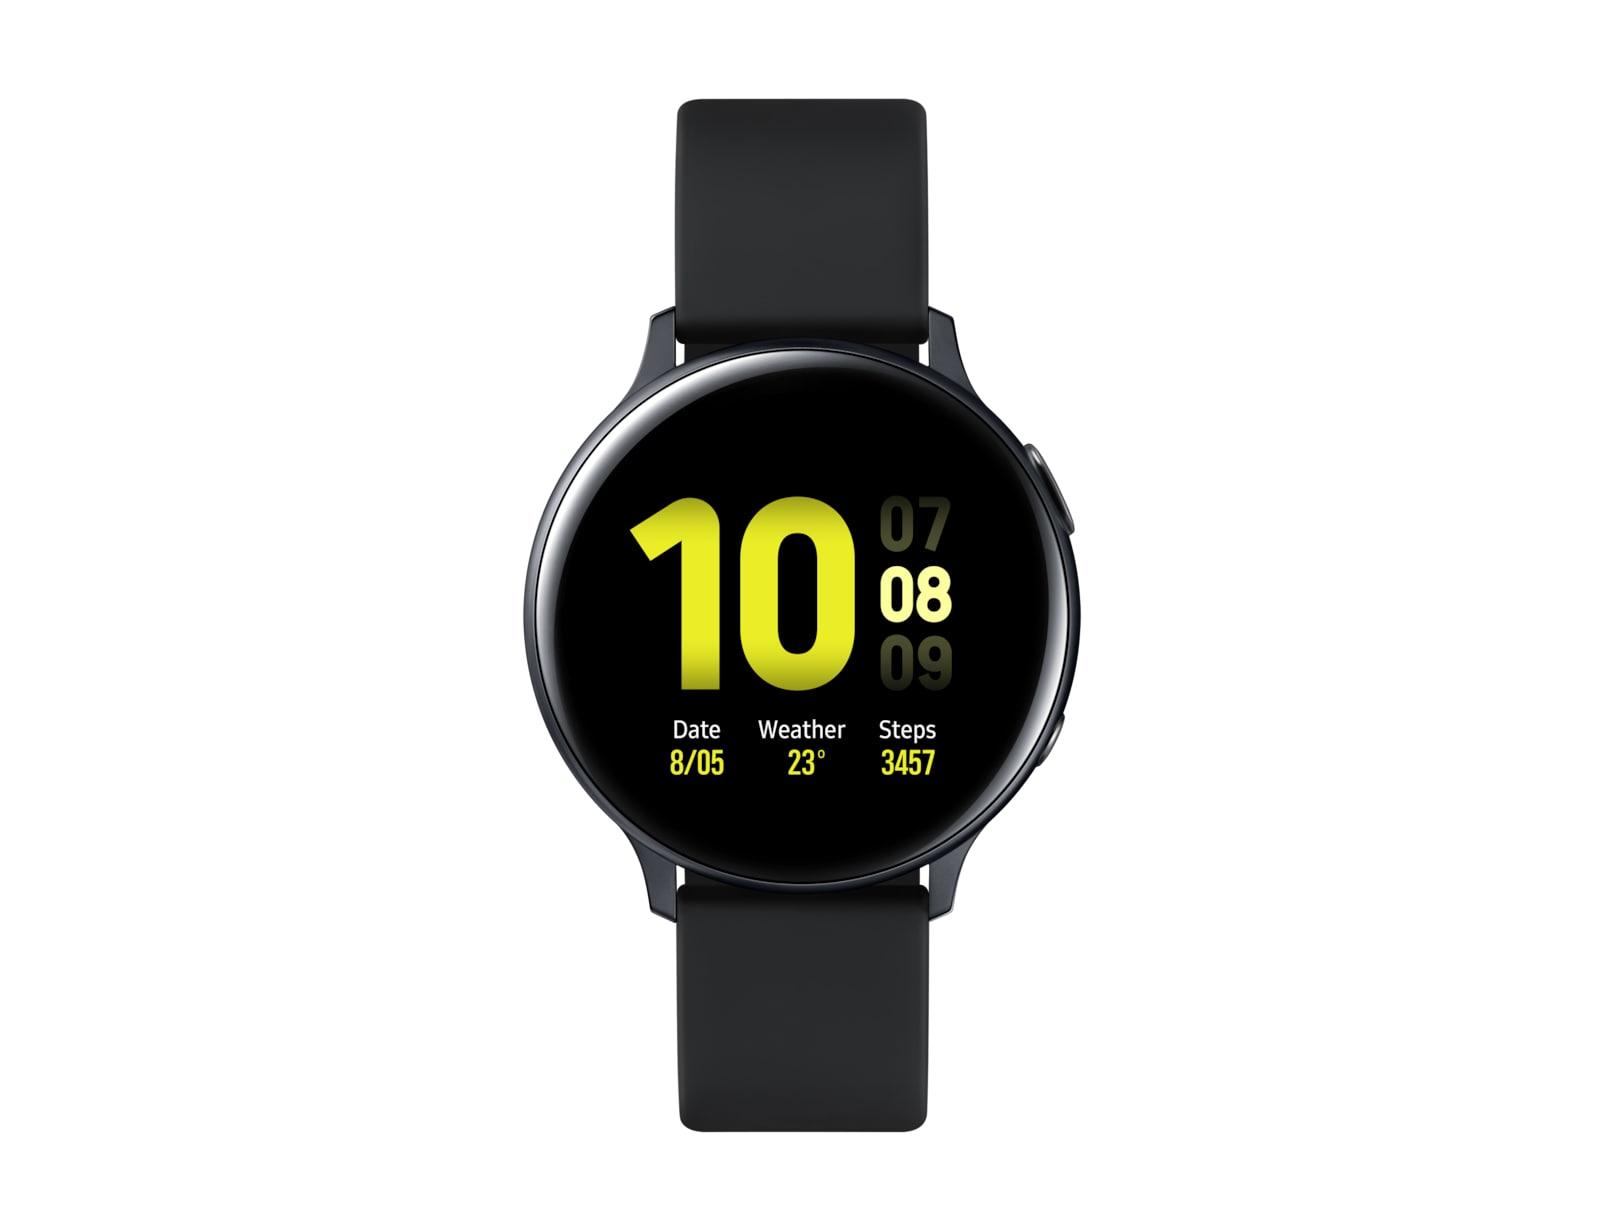 Samsung Galaxy Watch Active 2 smartwatch Black SAMOLED 3.43 cm (1.35